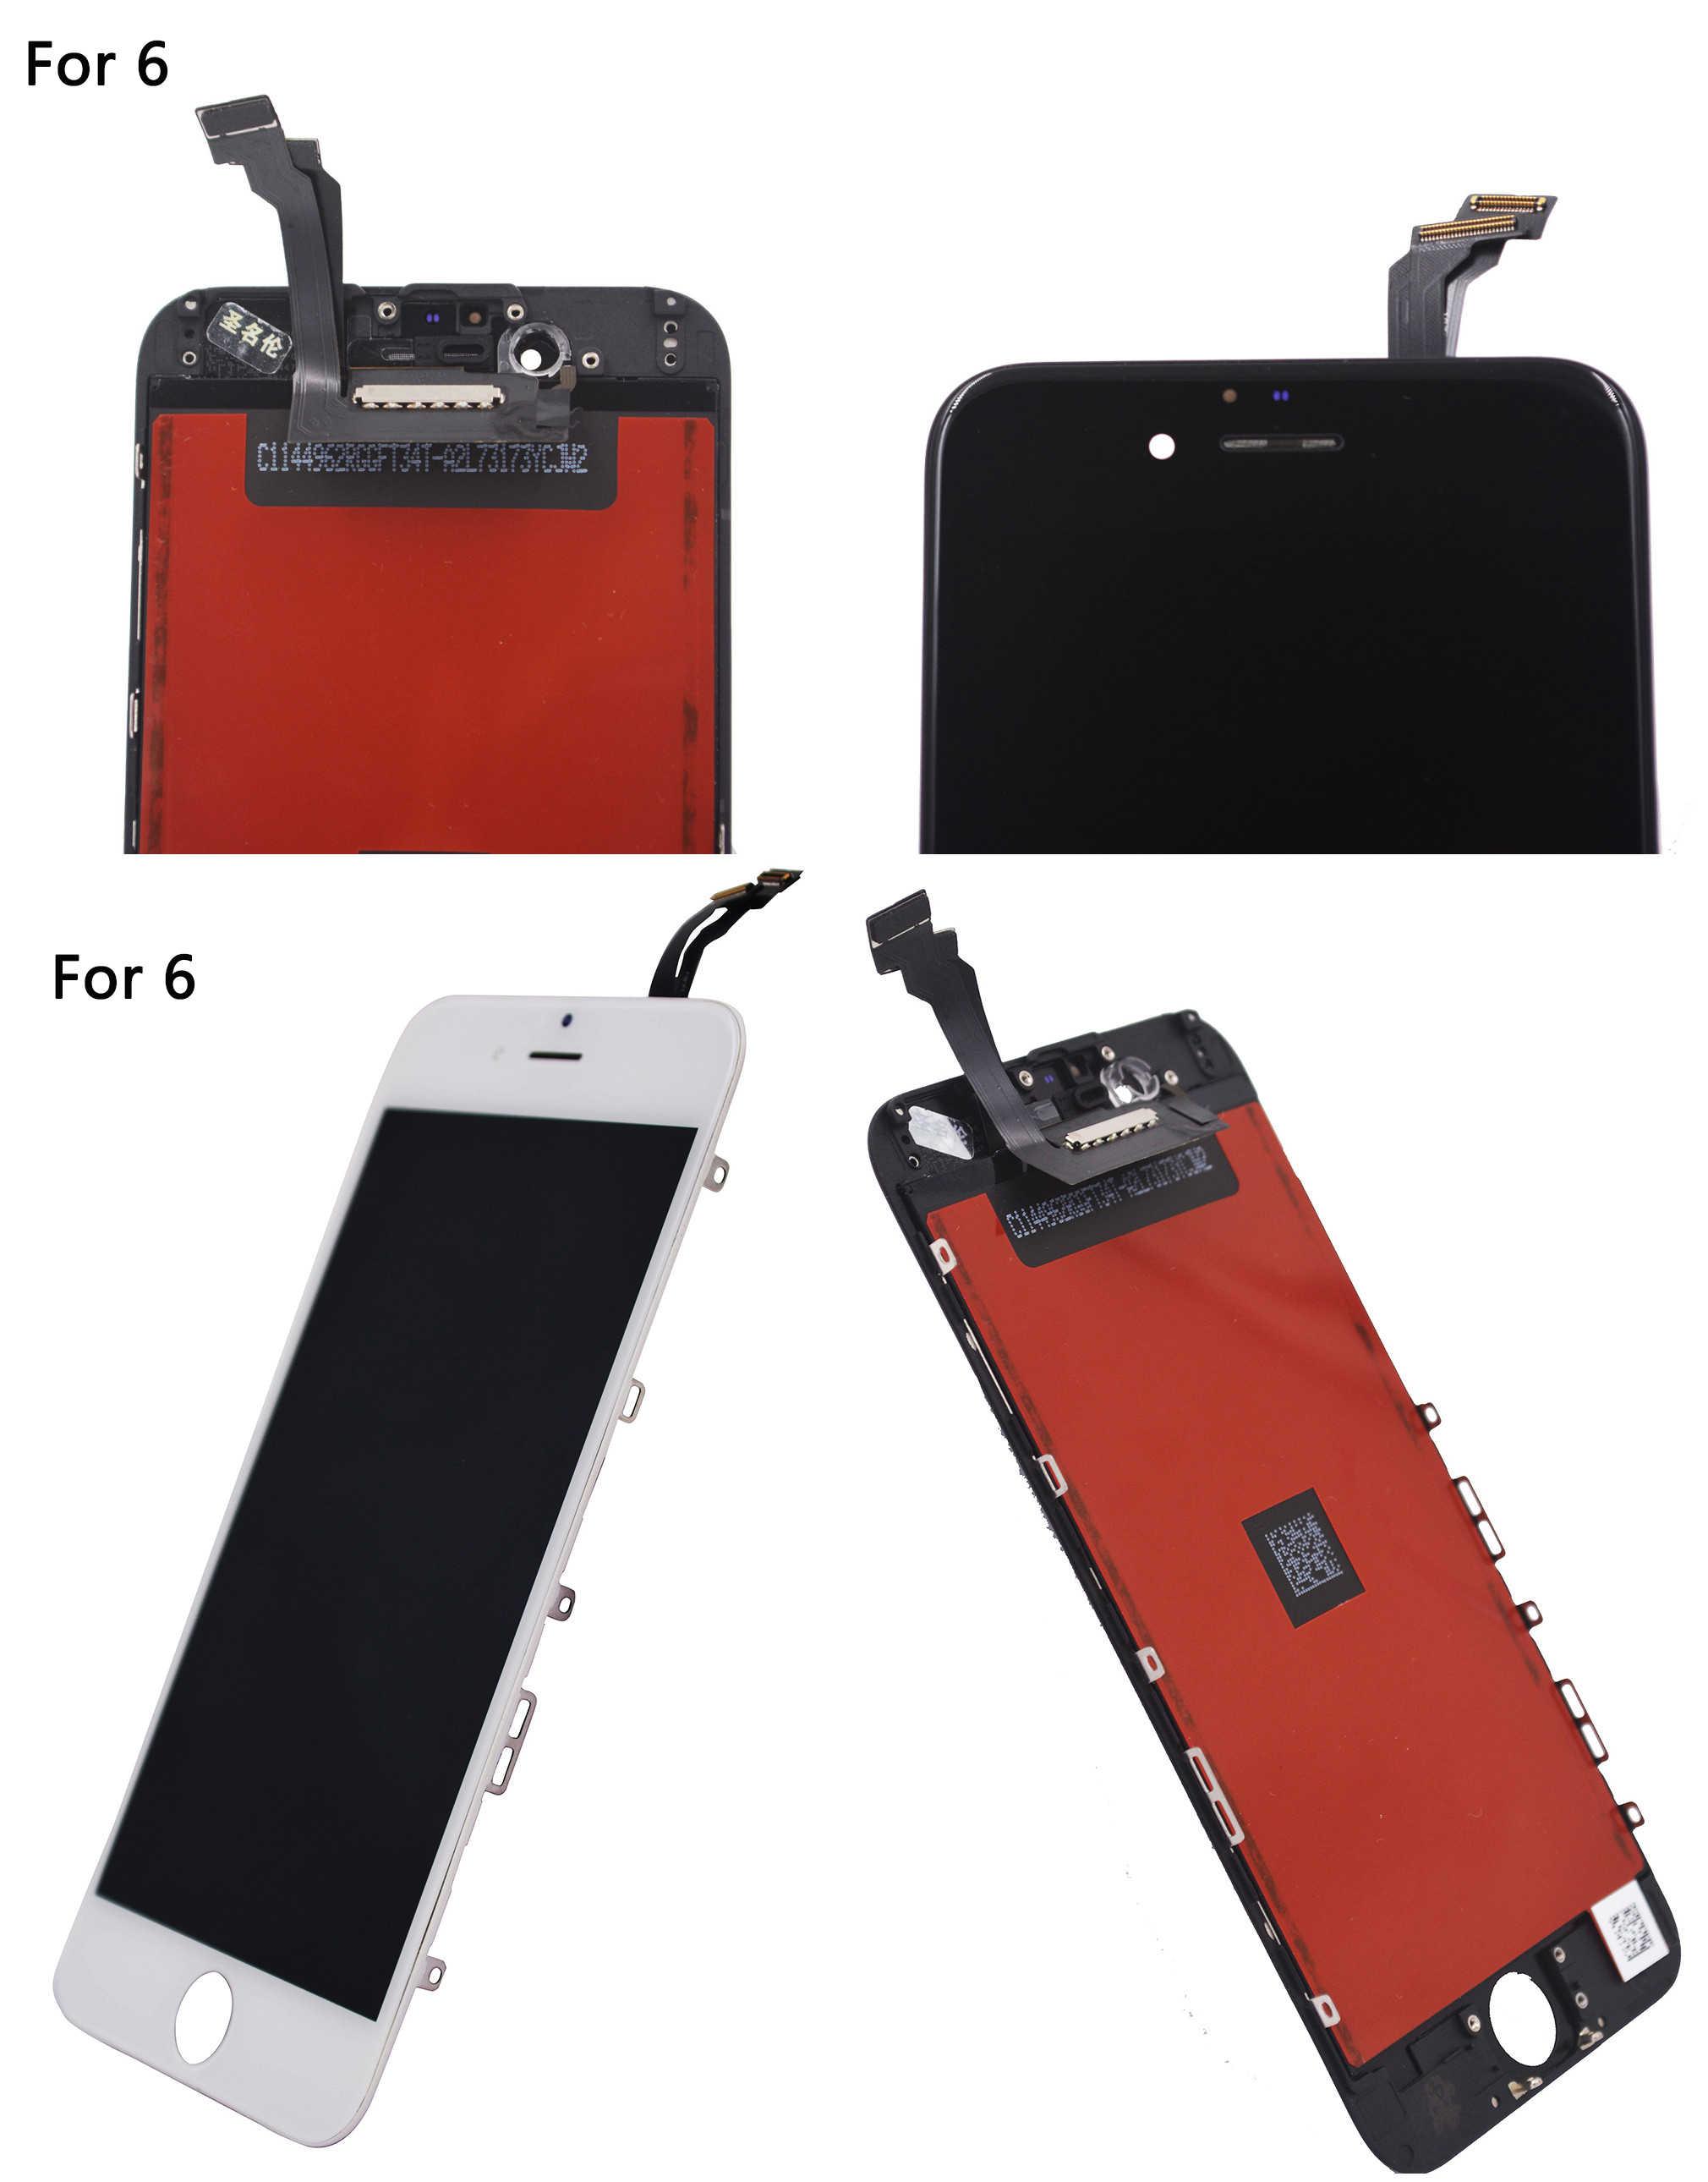 REPUESTO nuevo para iphone 6 lcd Display para iphone 6s LCD Display Touch digitalizador montaje para iphone 5s lcd